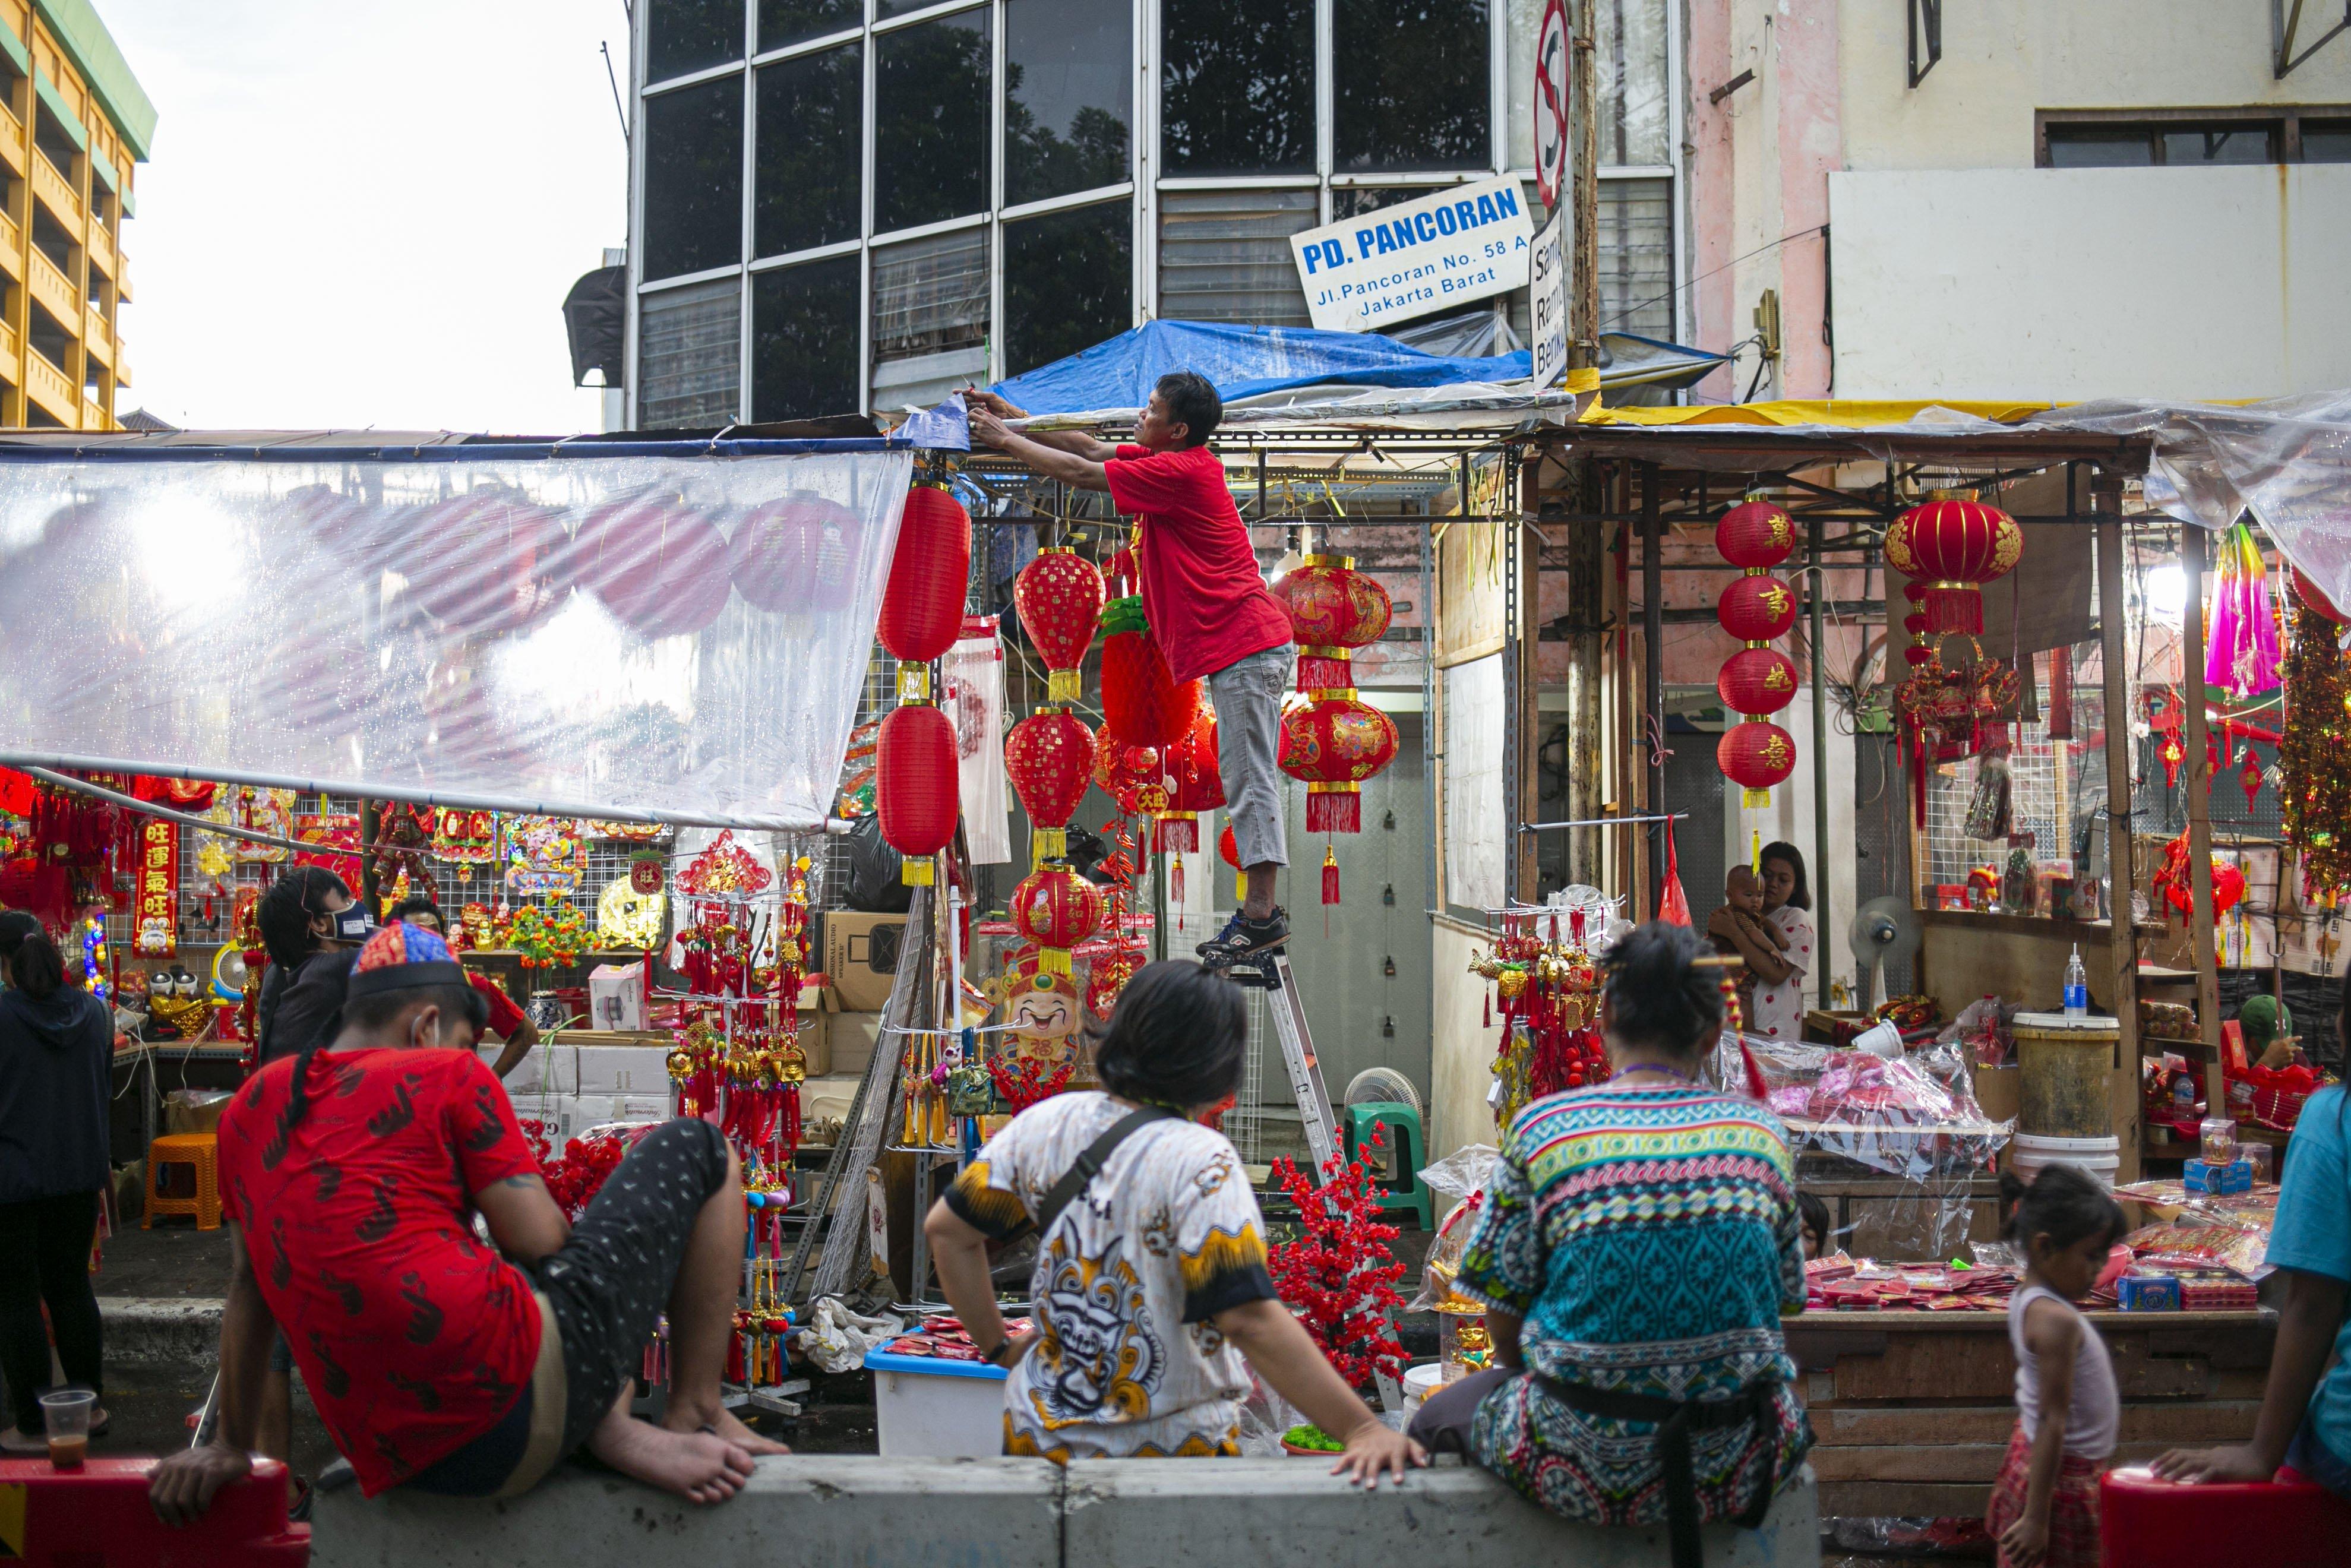 Pedagang merapikan kios pernak-pernik Imlek yang dijual di Pasar Glodok, Jakarta, Kamis (11/2/2021). Pedagang di lokasi tersebut mengaku penjualan tahun ini anjlok hingga 80 persen dibandingkan tahun lalu akibat pandemi COVID 19.